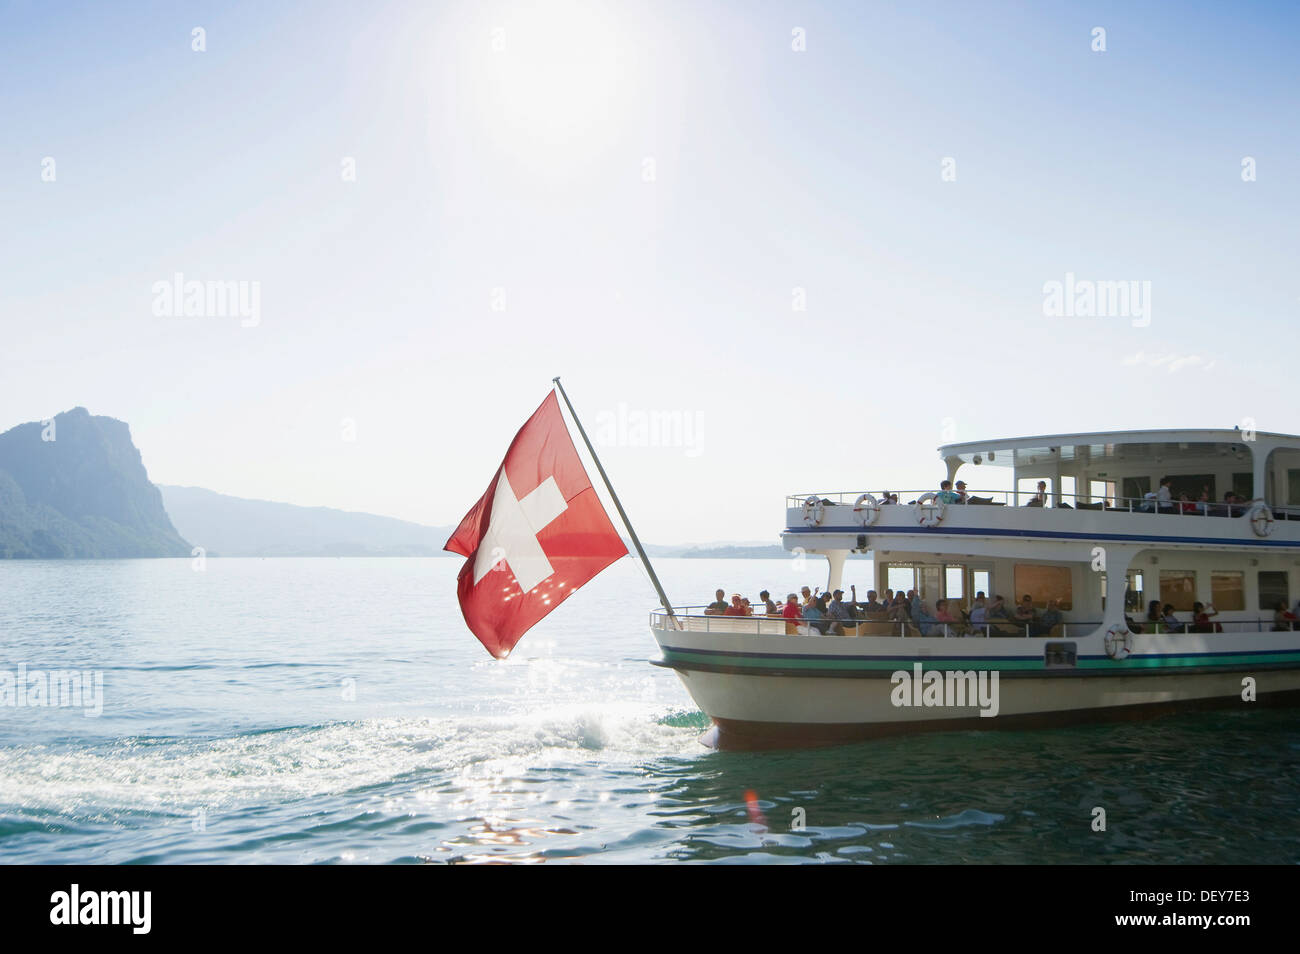 Passenger boat, liner, with the Swiss flag, Vitznau, Lake Lucerne, Canton of Lucerne, Switzerland, Europe - Stock Image